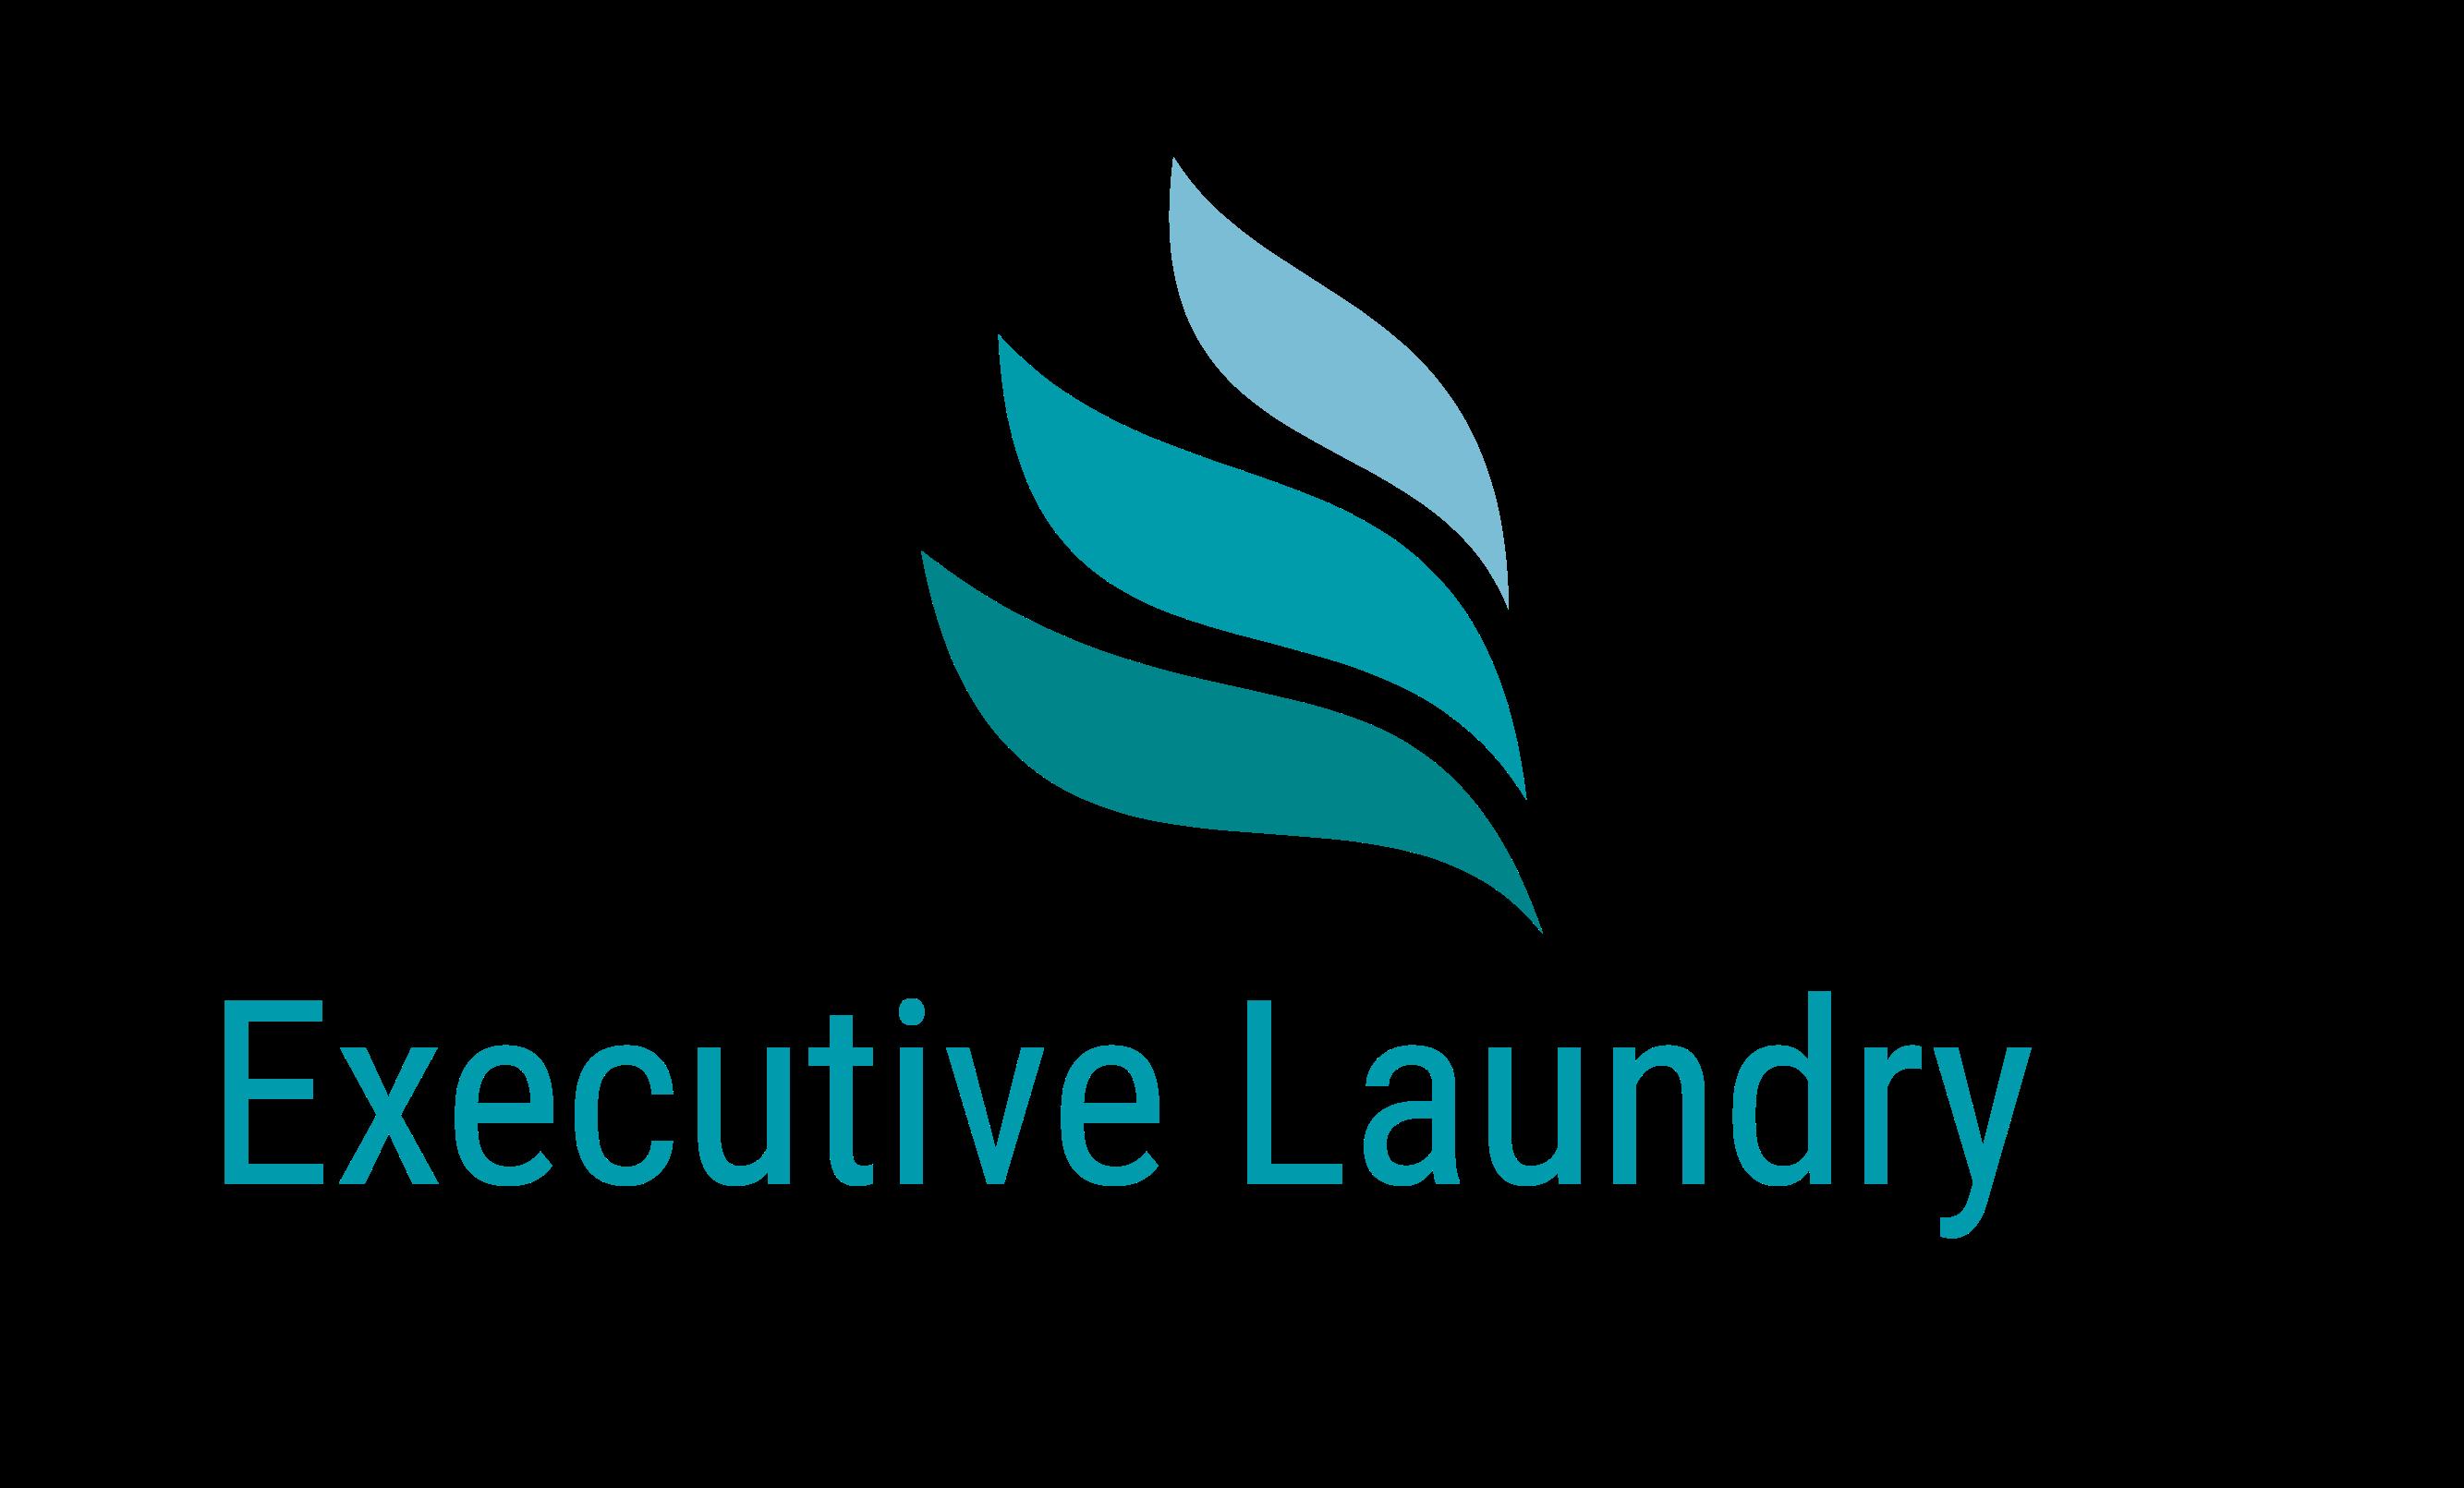 Executive Laundry Logo